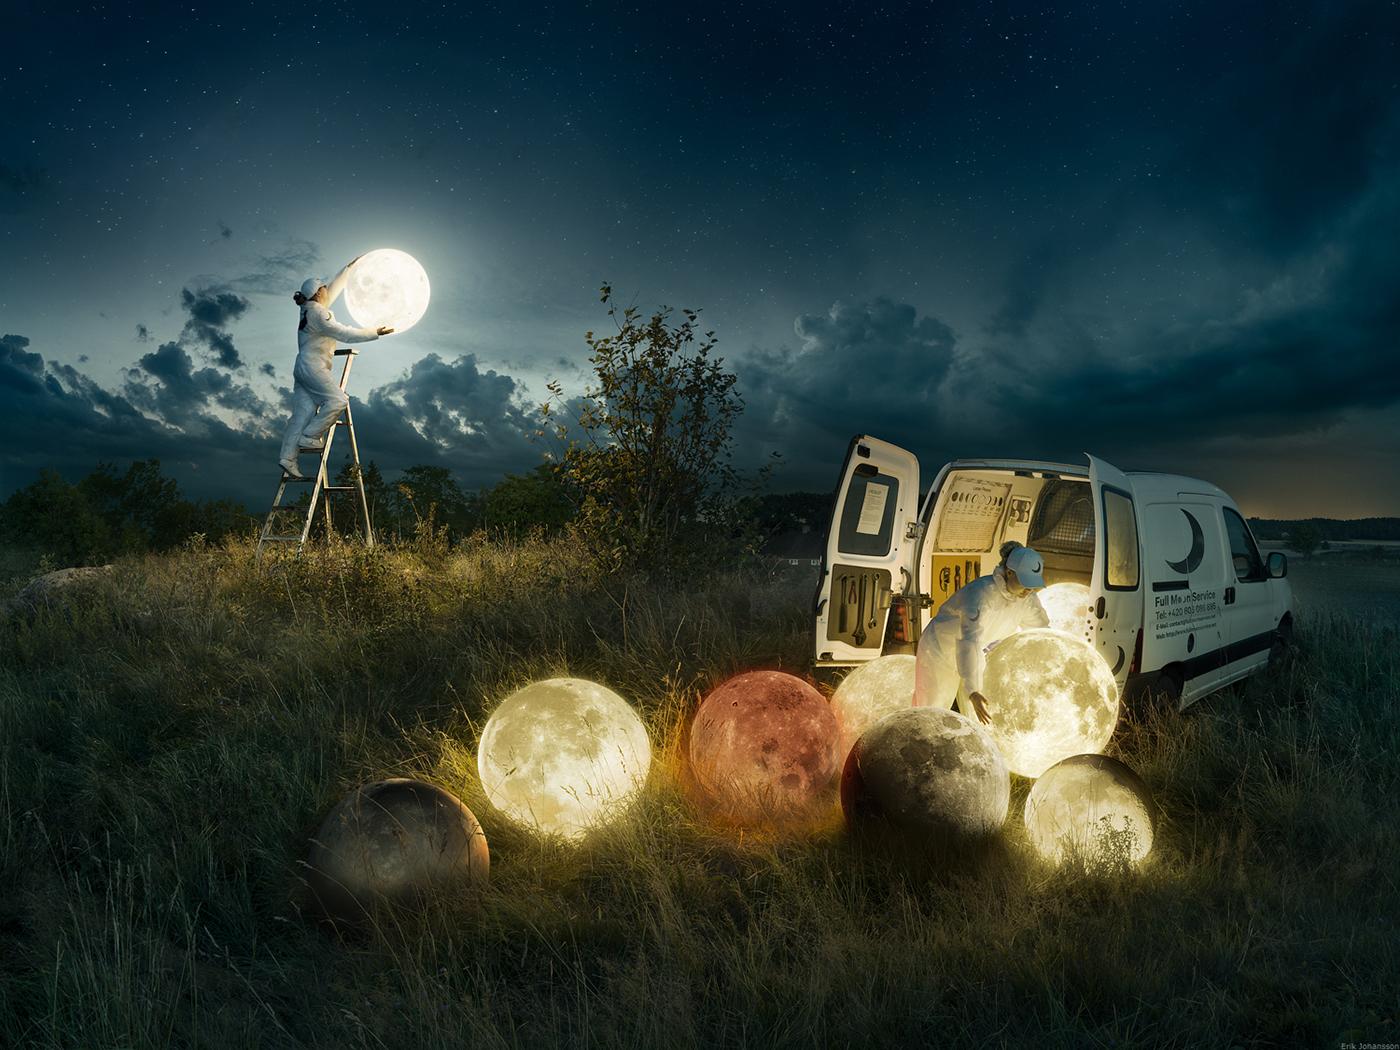 Full Moon Service Erik Johansson Fotografía